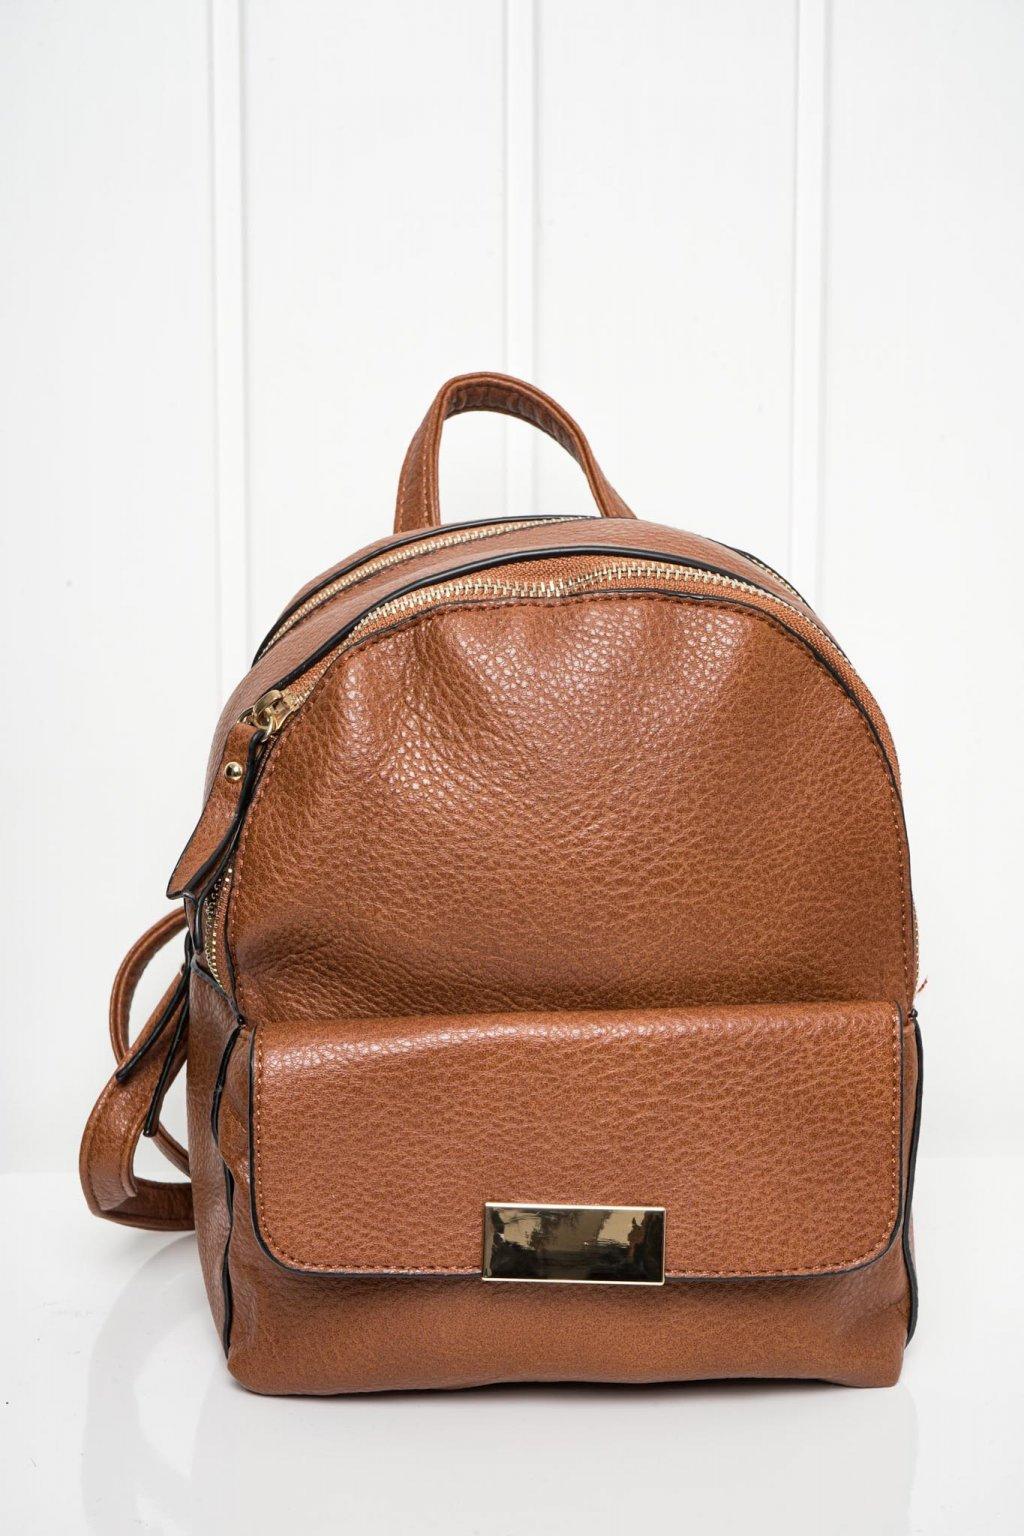 Kabelka, crossbody, ruksak, shopping bag, shopperka, 437